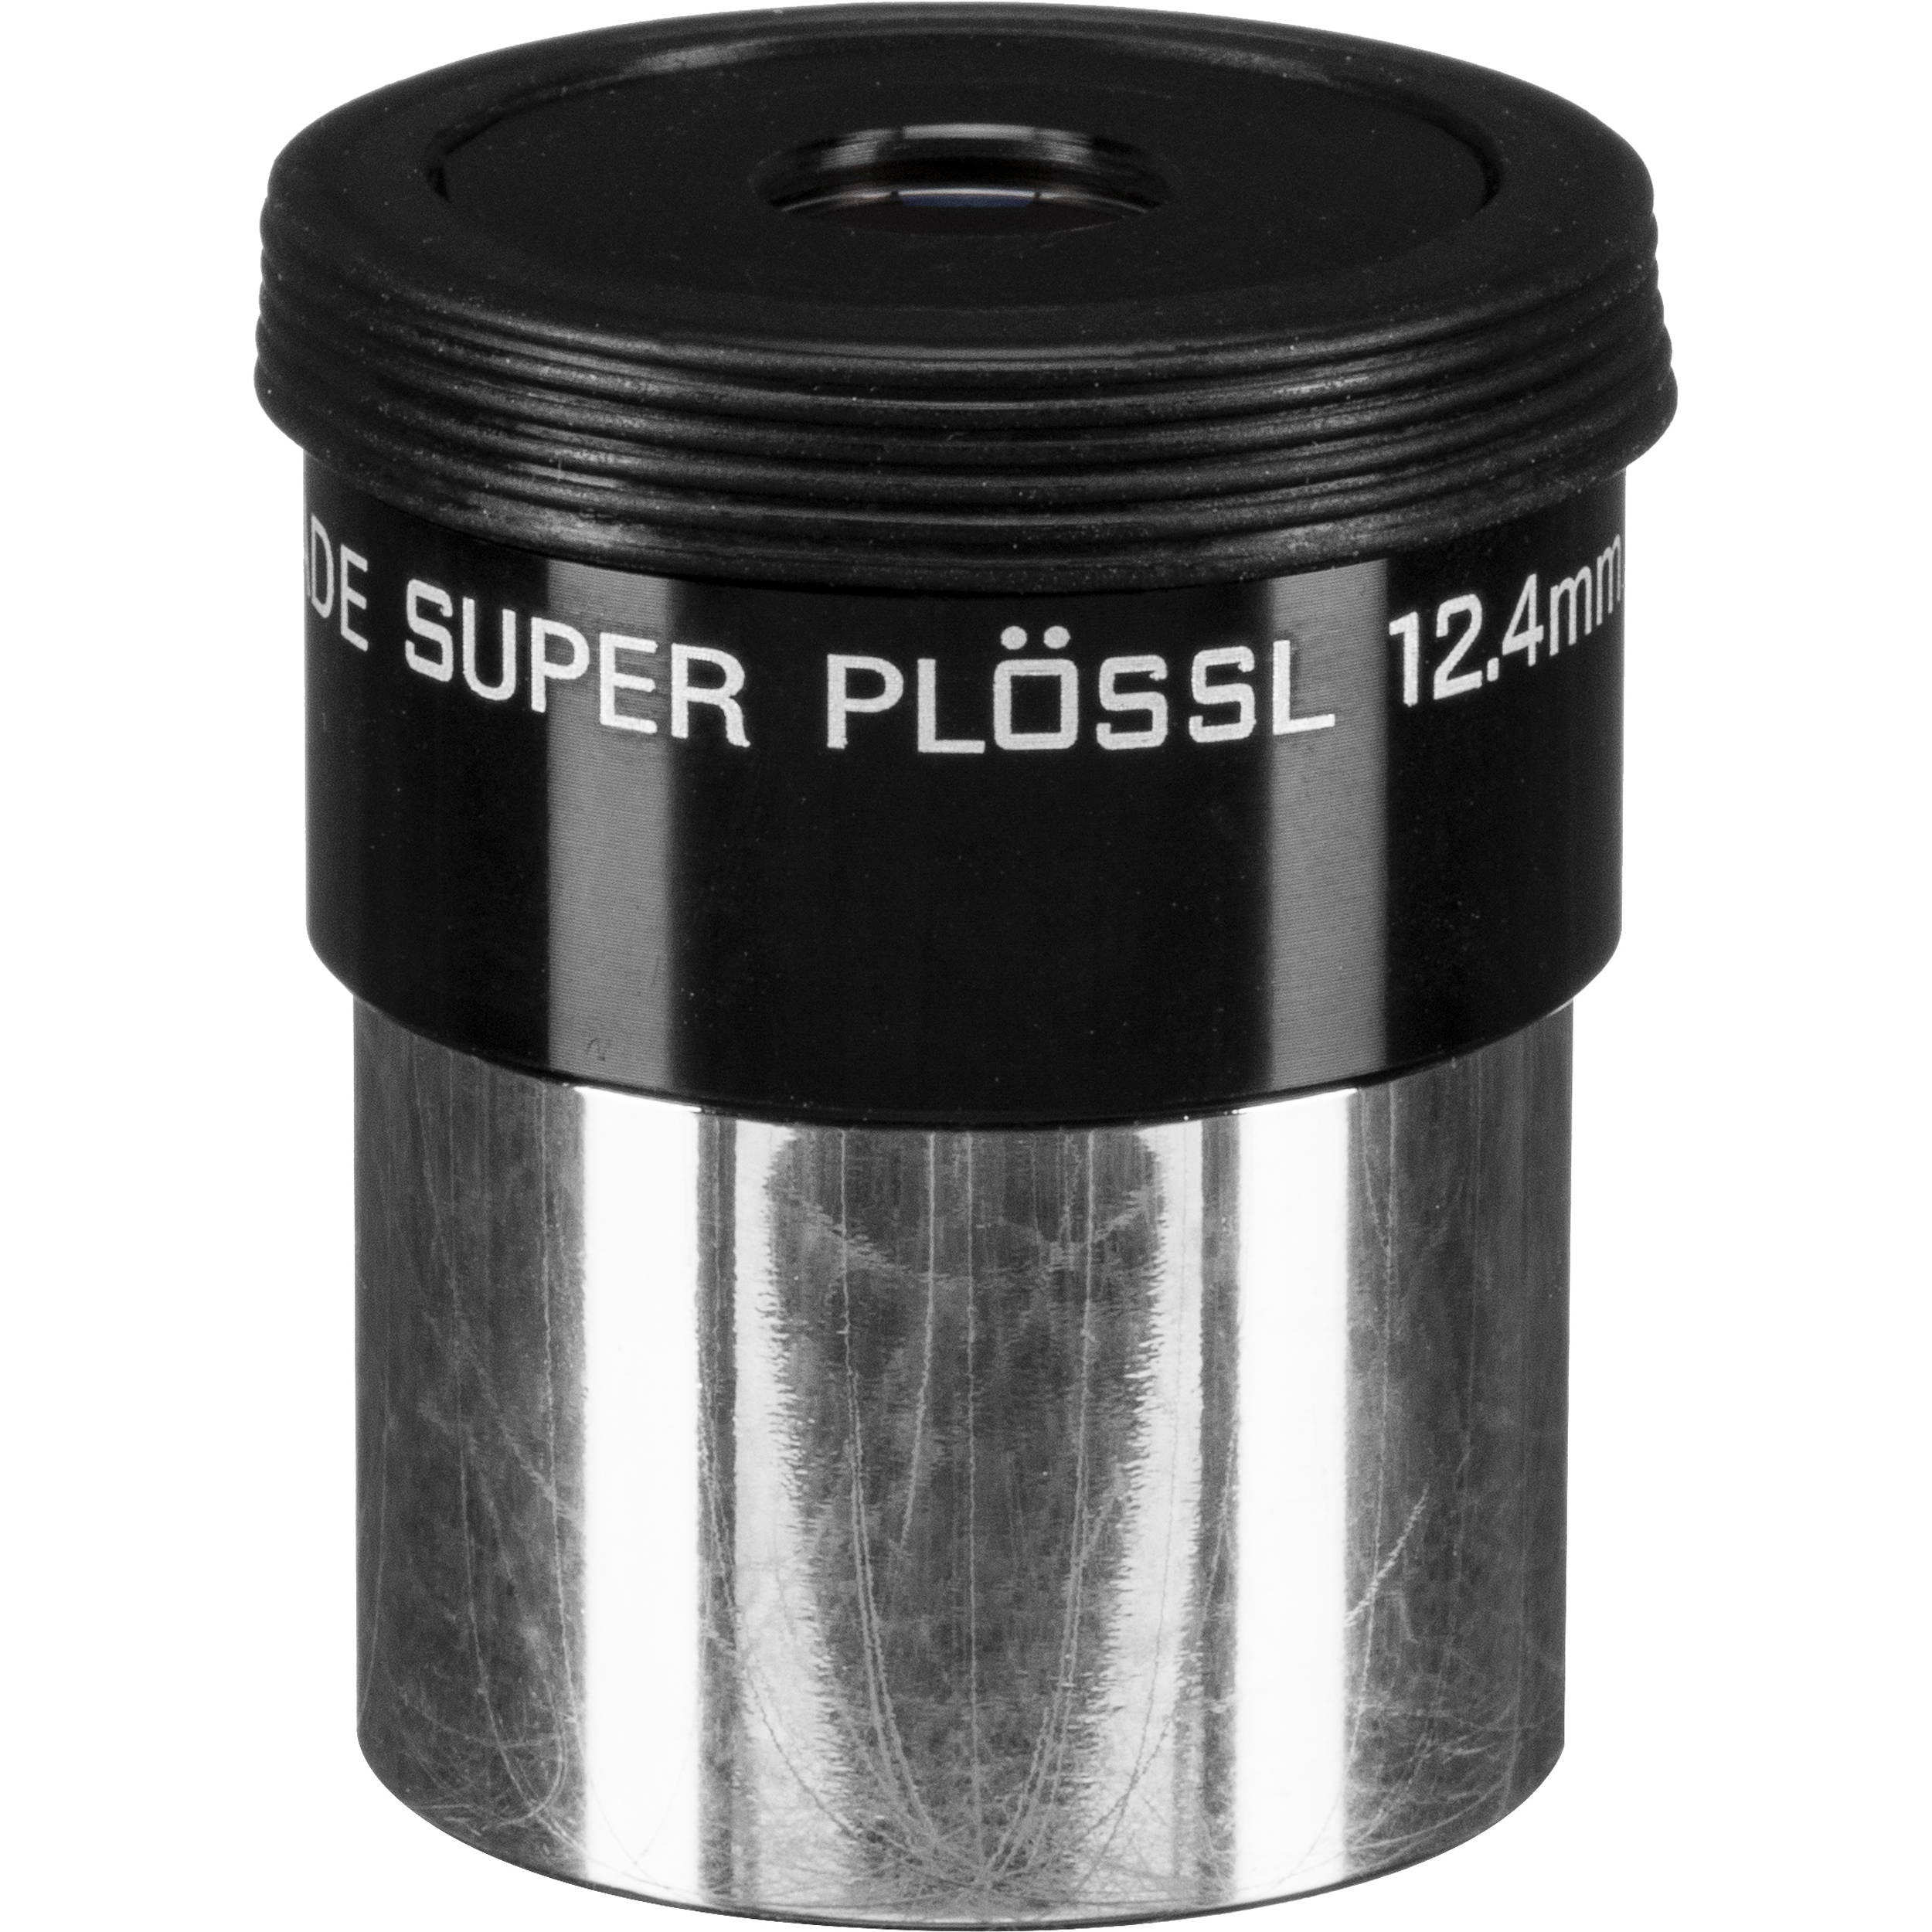 Meade Instruments 07176-02 Series 4000 32mm Super Plossl Eyepiece